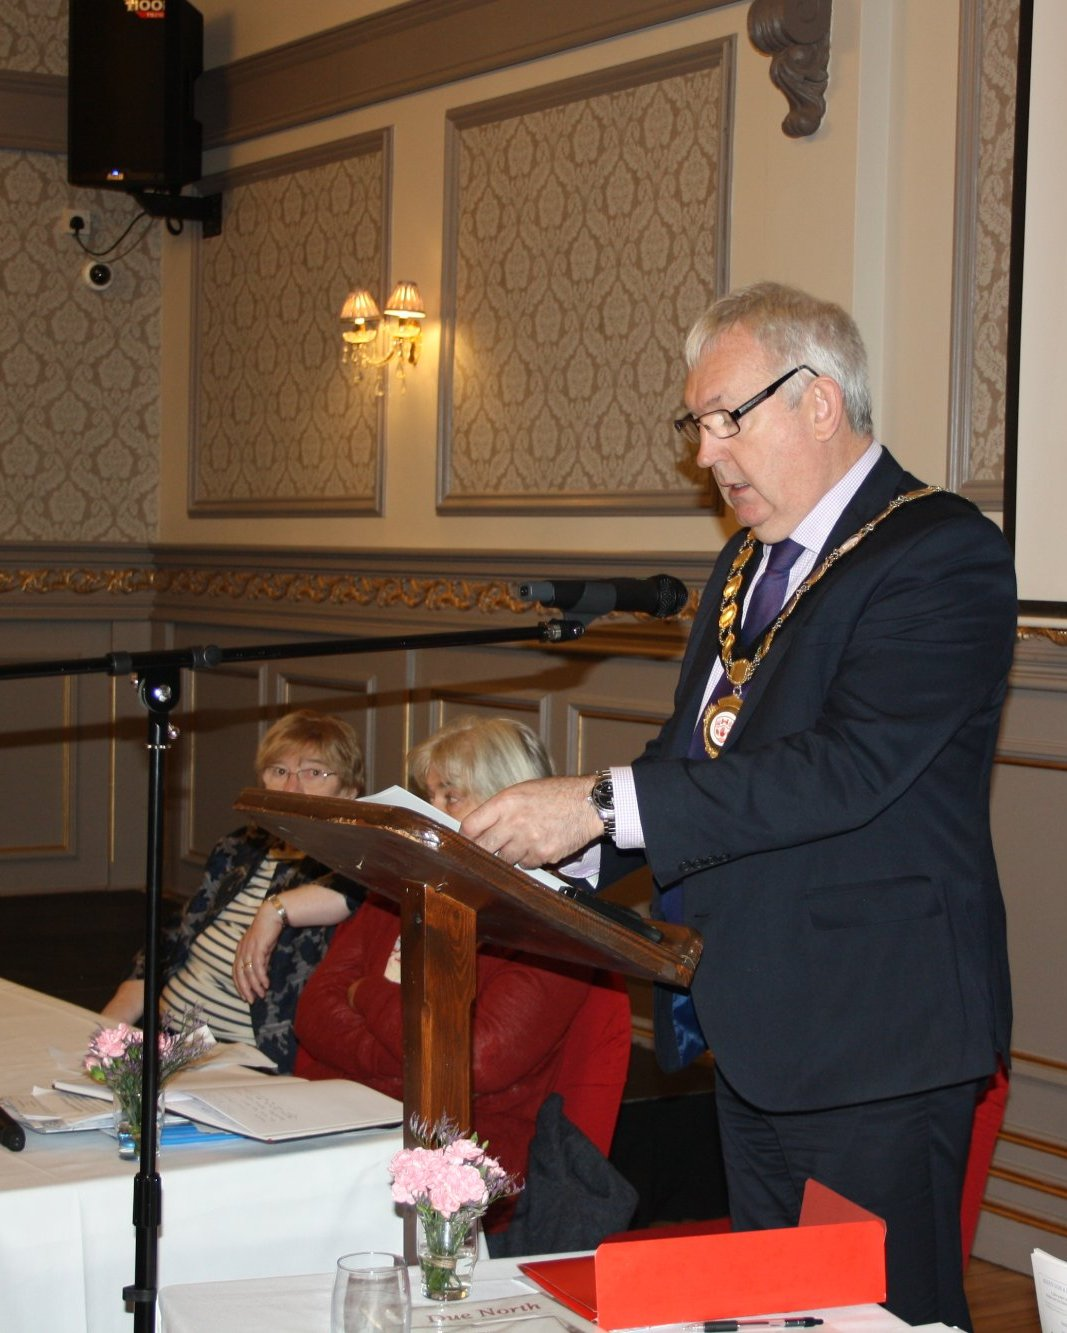 Council Chairman